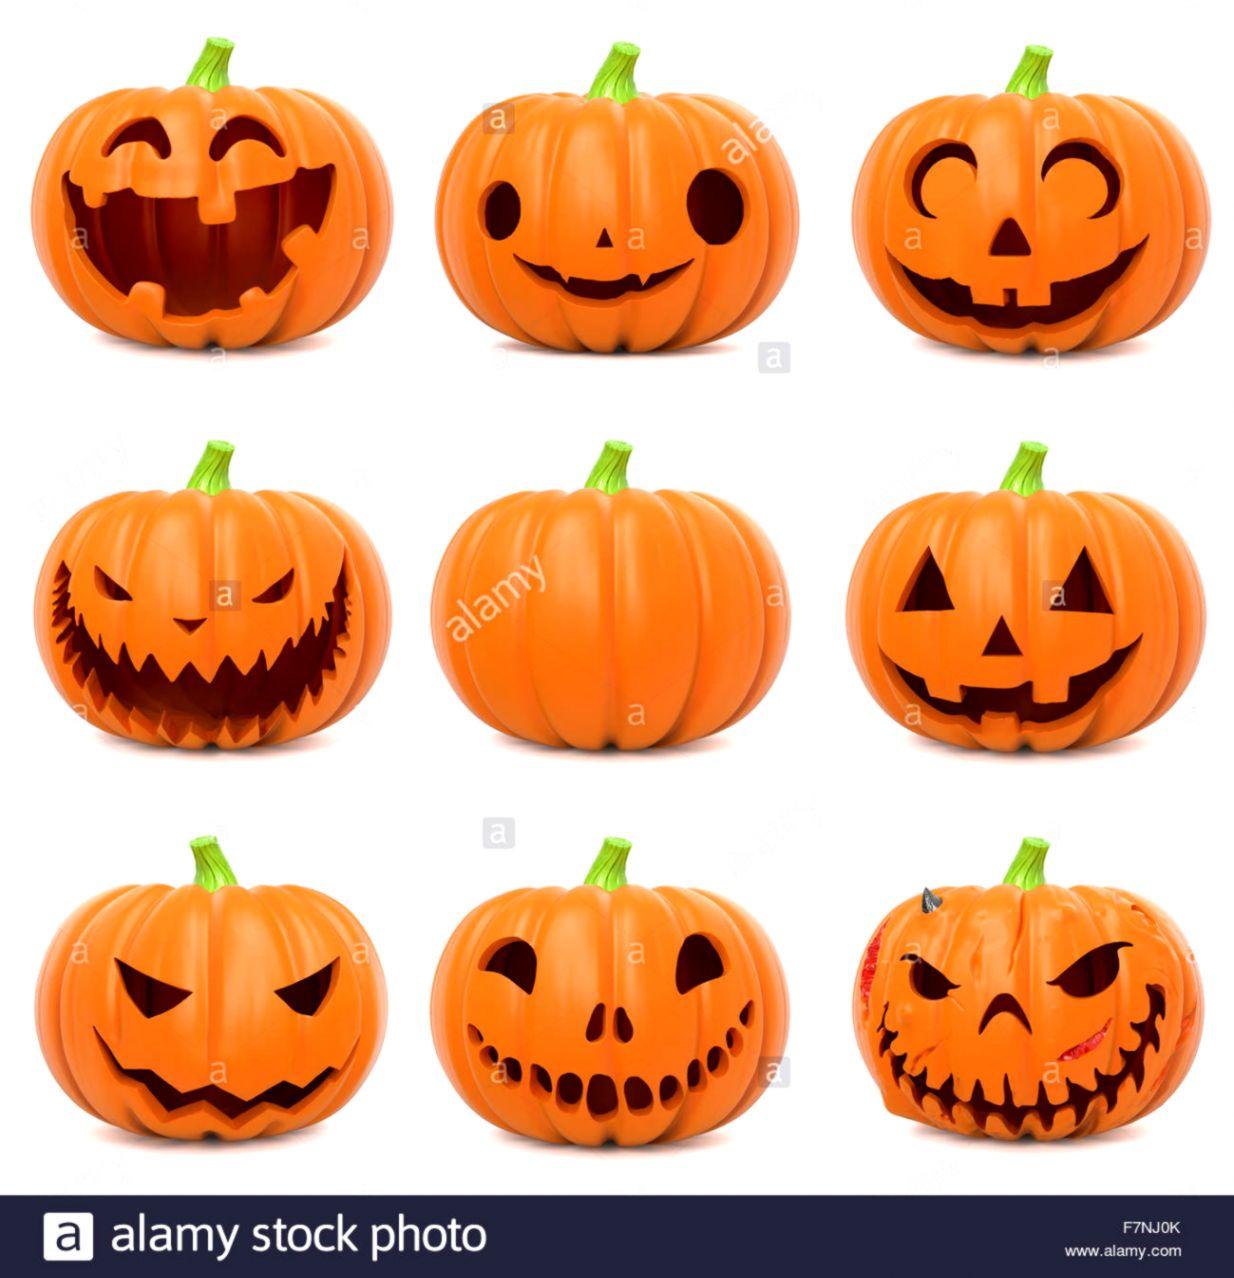 Funny Halloween pumpkins Stock Photo 90829555 Alamy